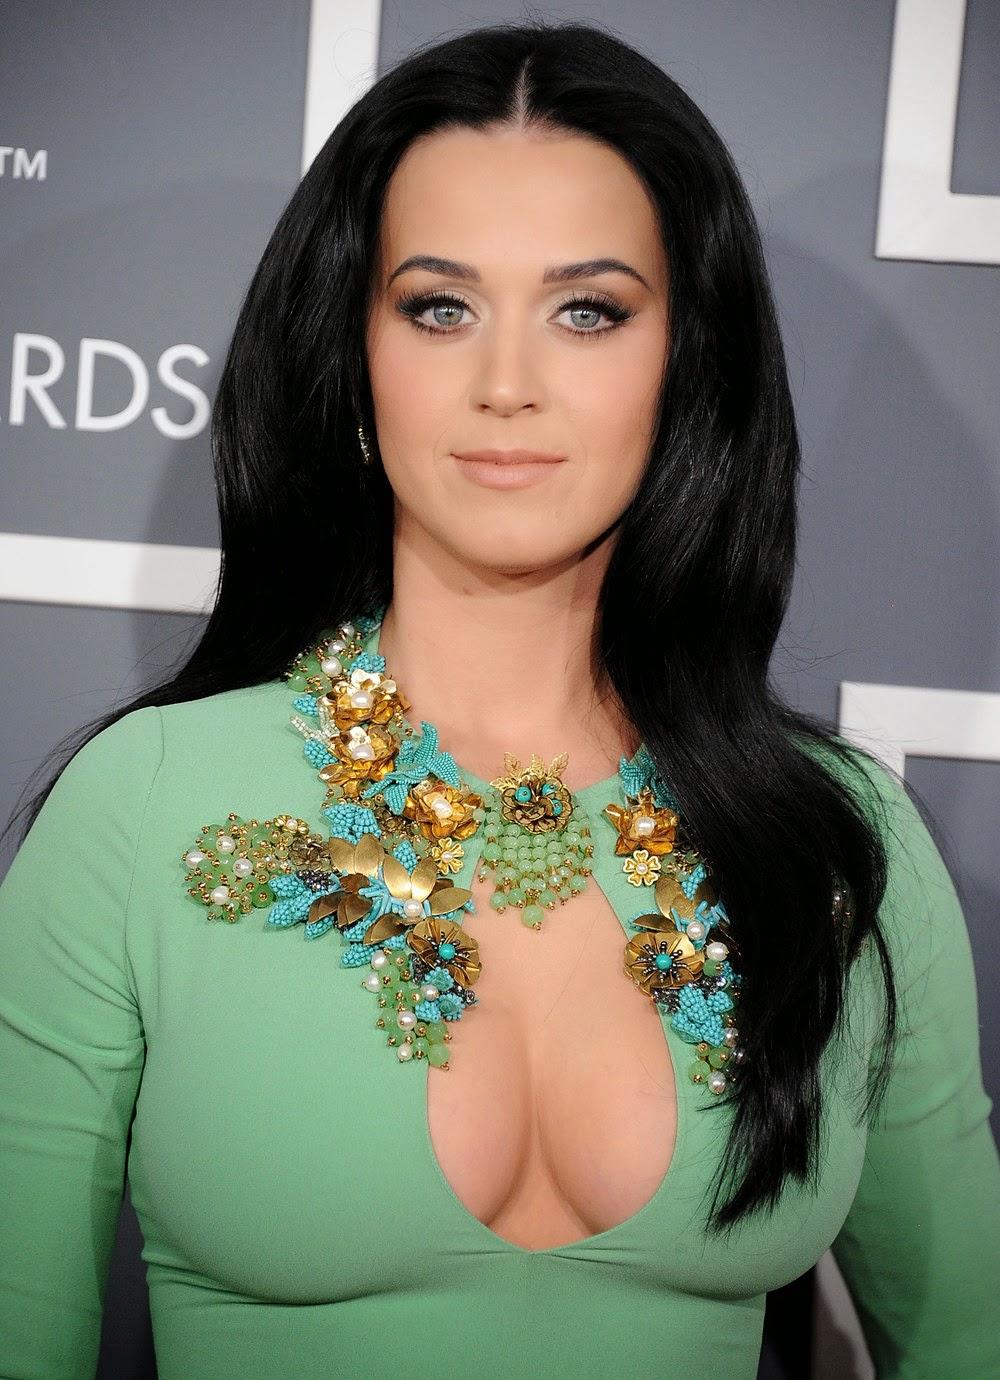 Katy perry com for